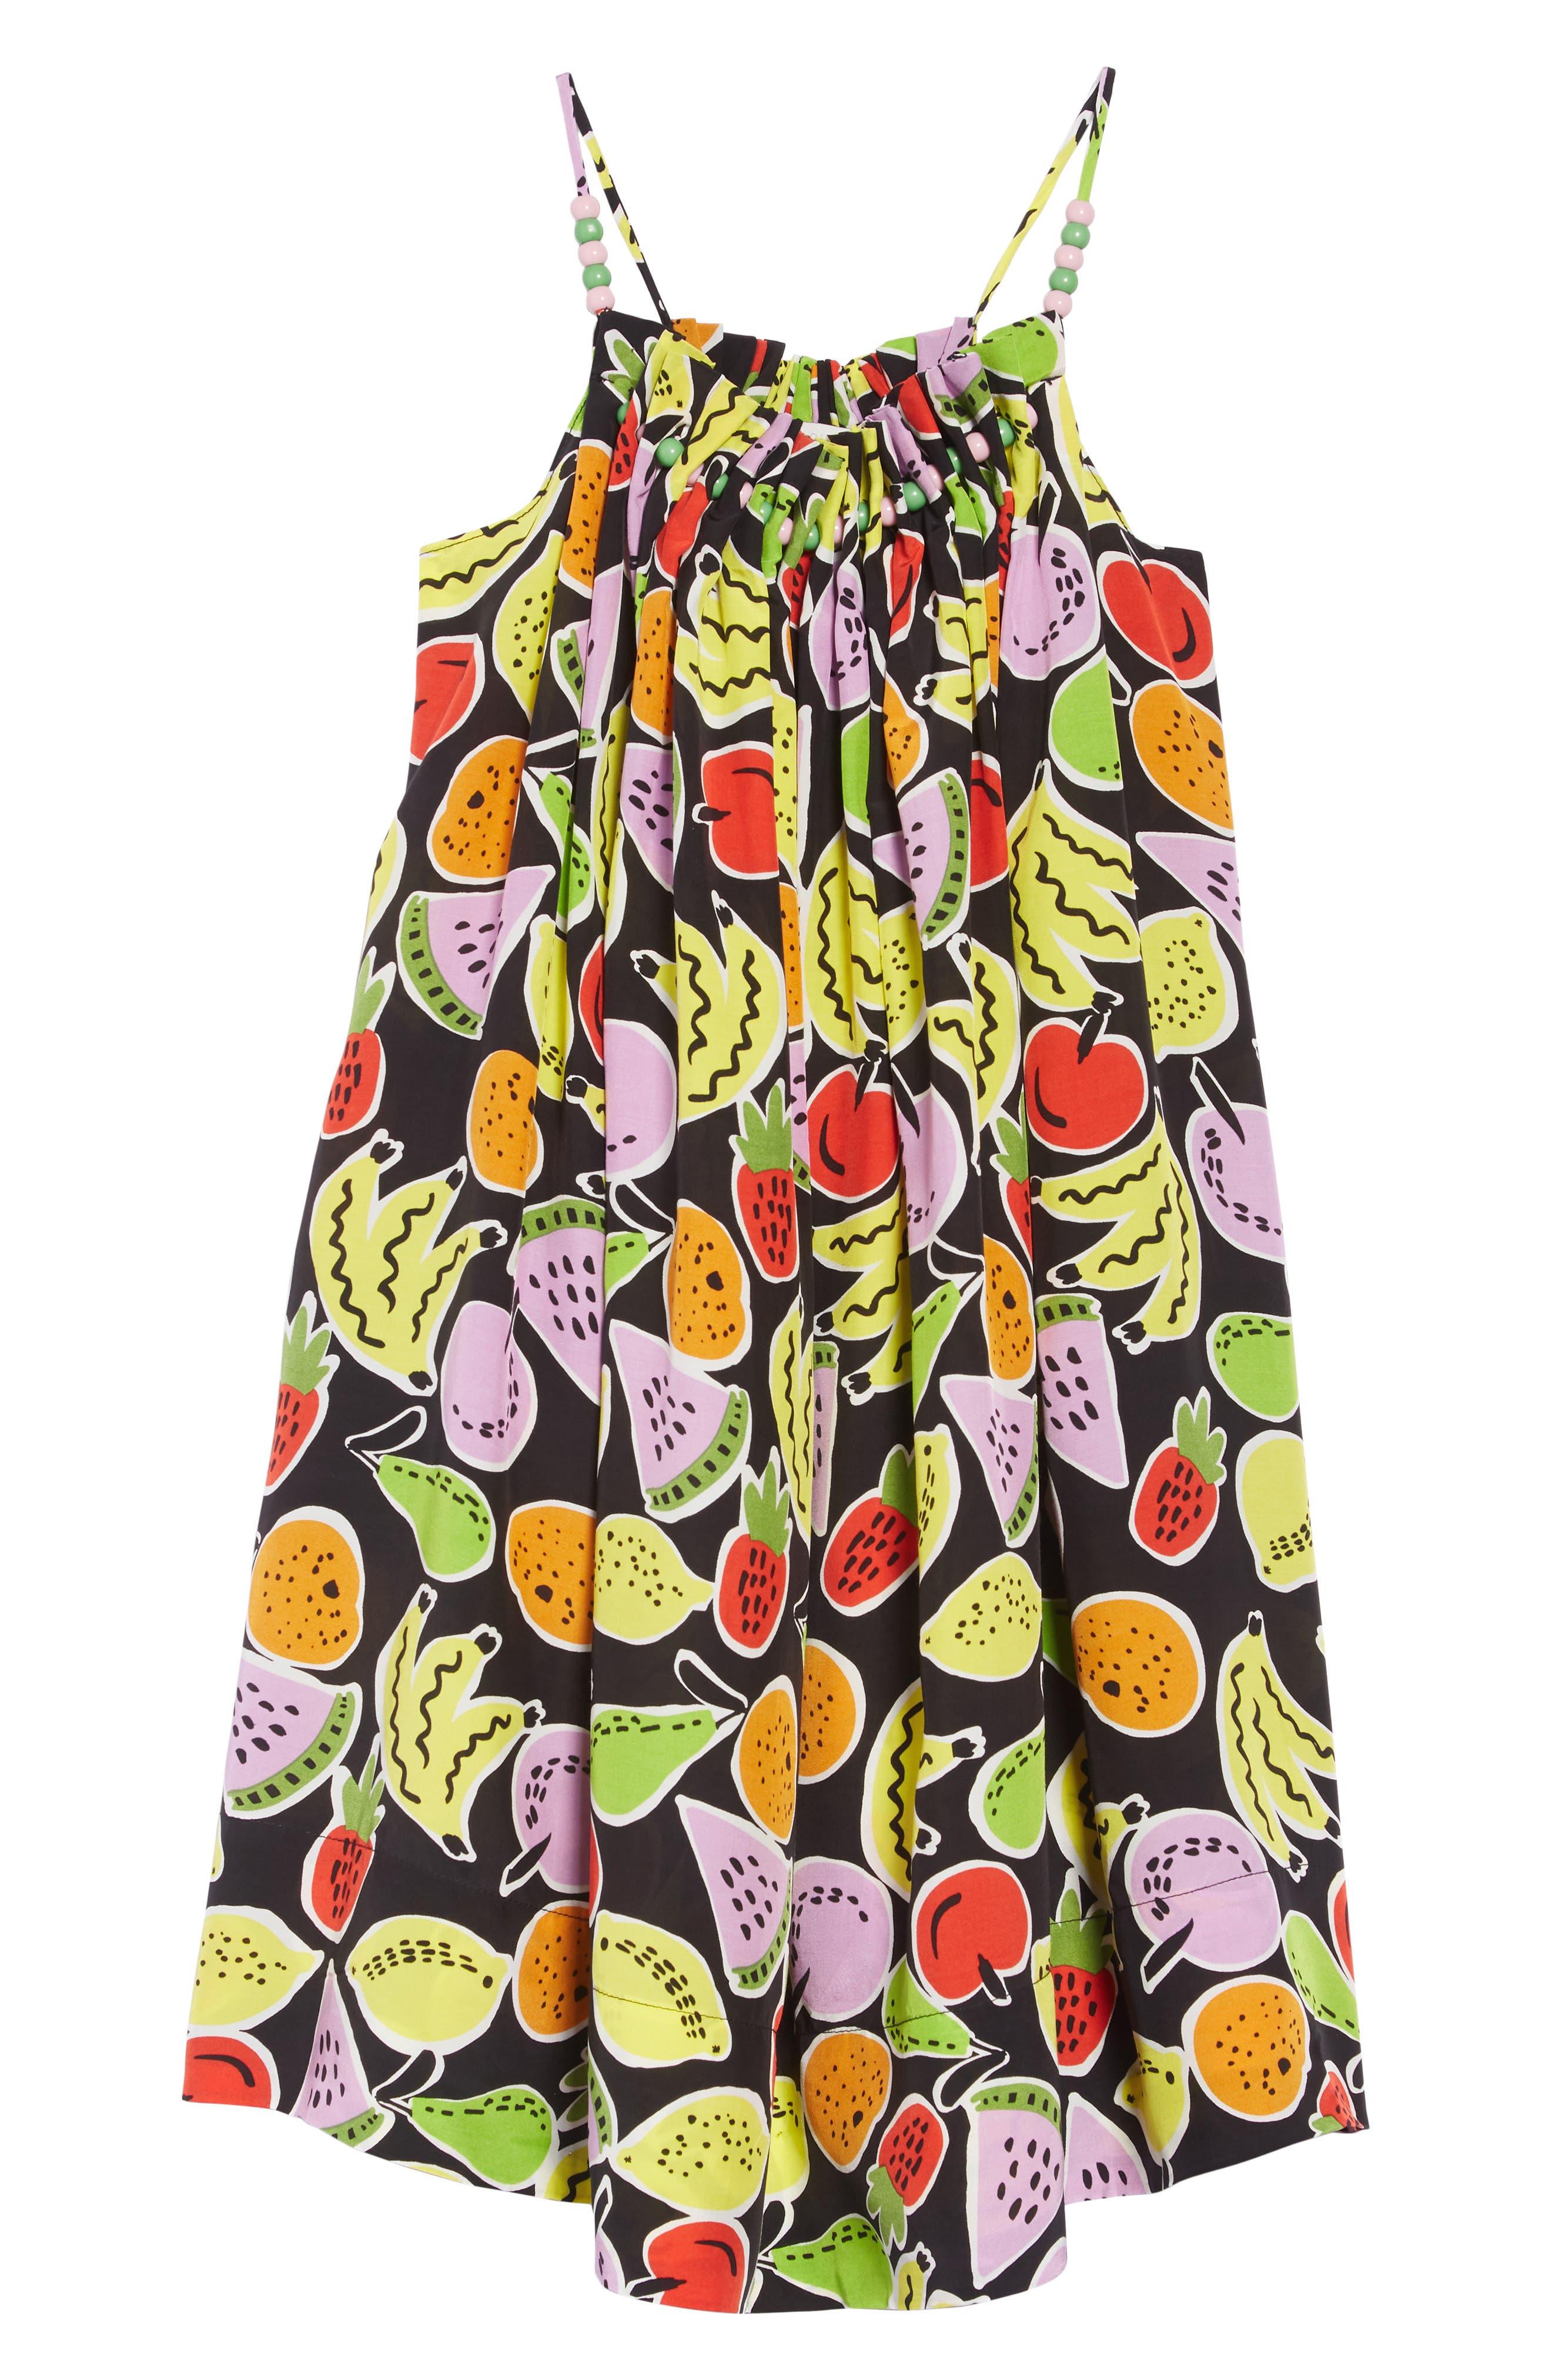 Stella McCartney Fruit Print Sundress,                             Main thumbnail 1, color,                             1090 BLACK